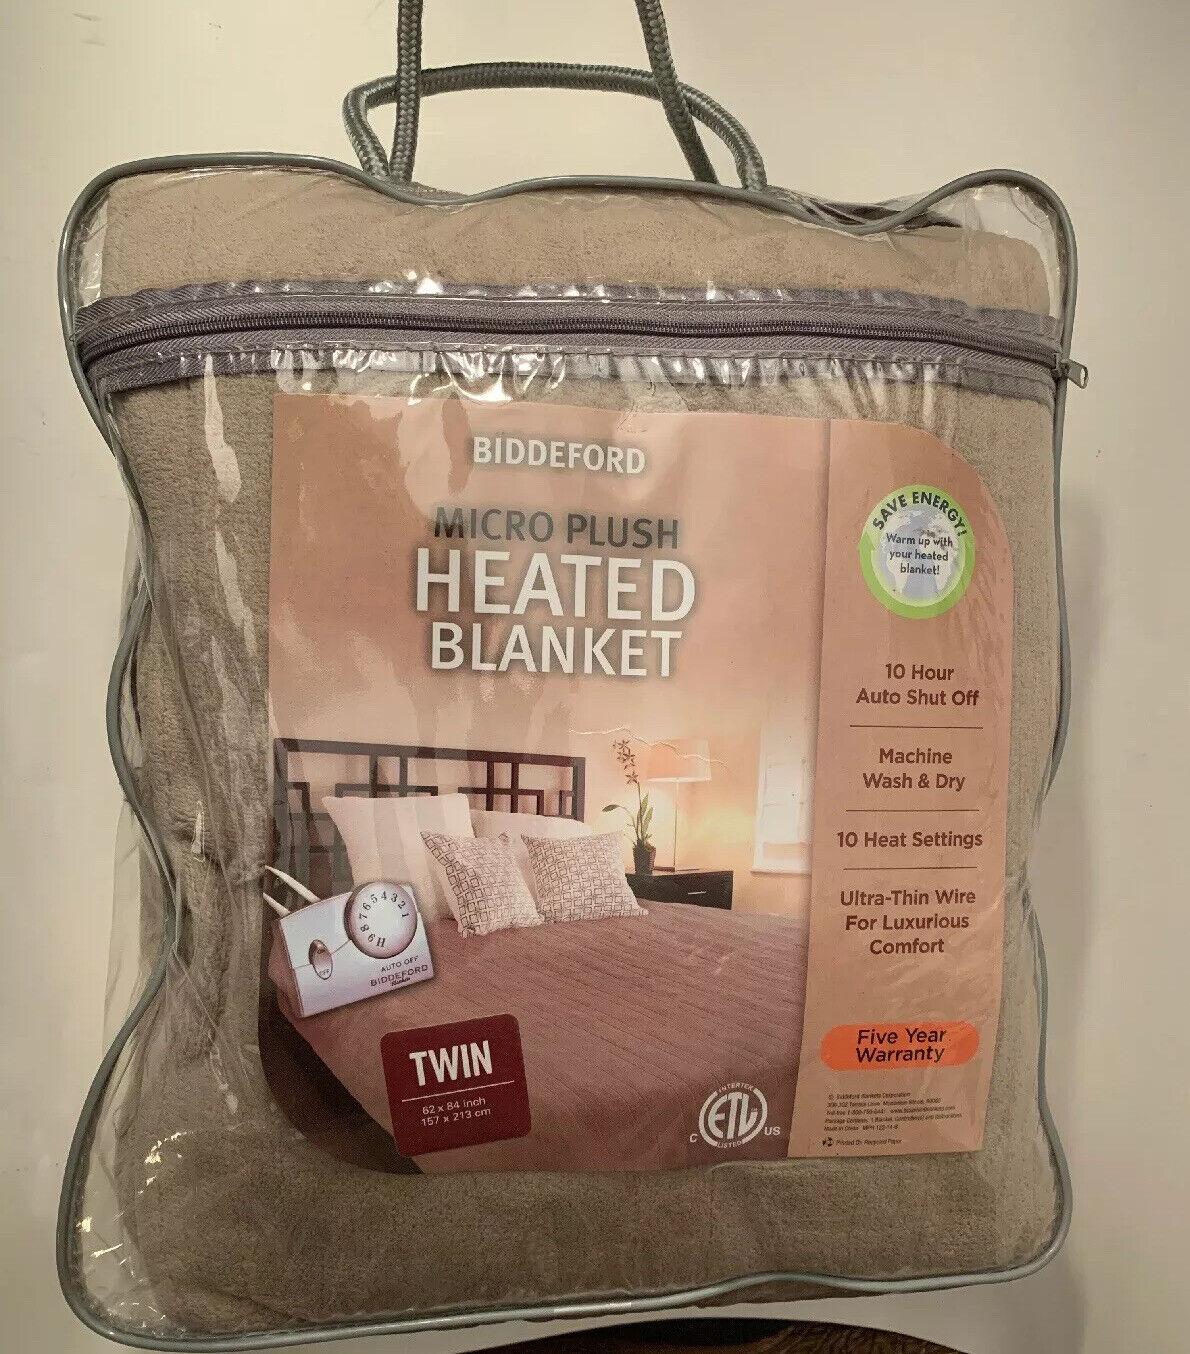 Biddeford Micro Plush Electric Heated Blanket Twin Taupe 10 Heat Settings Nip For Sale Online